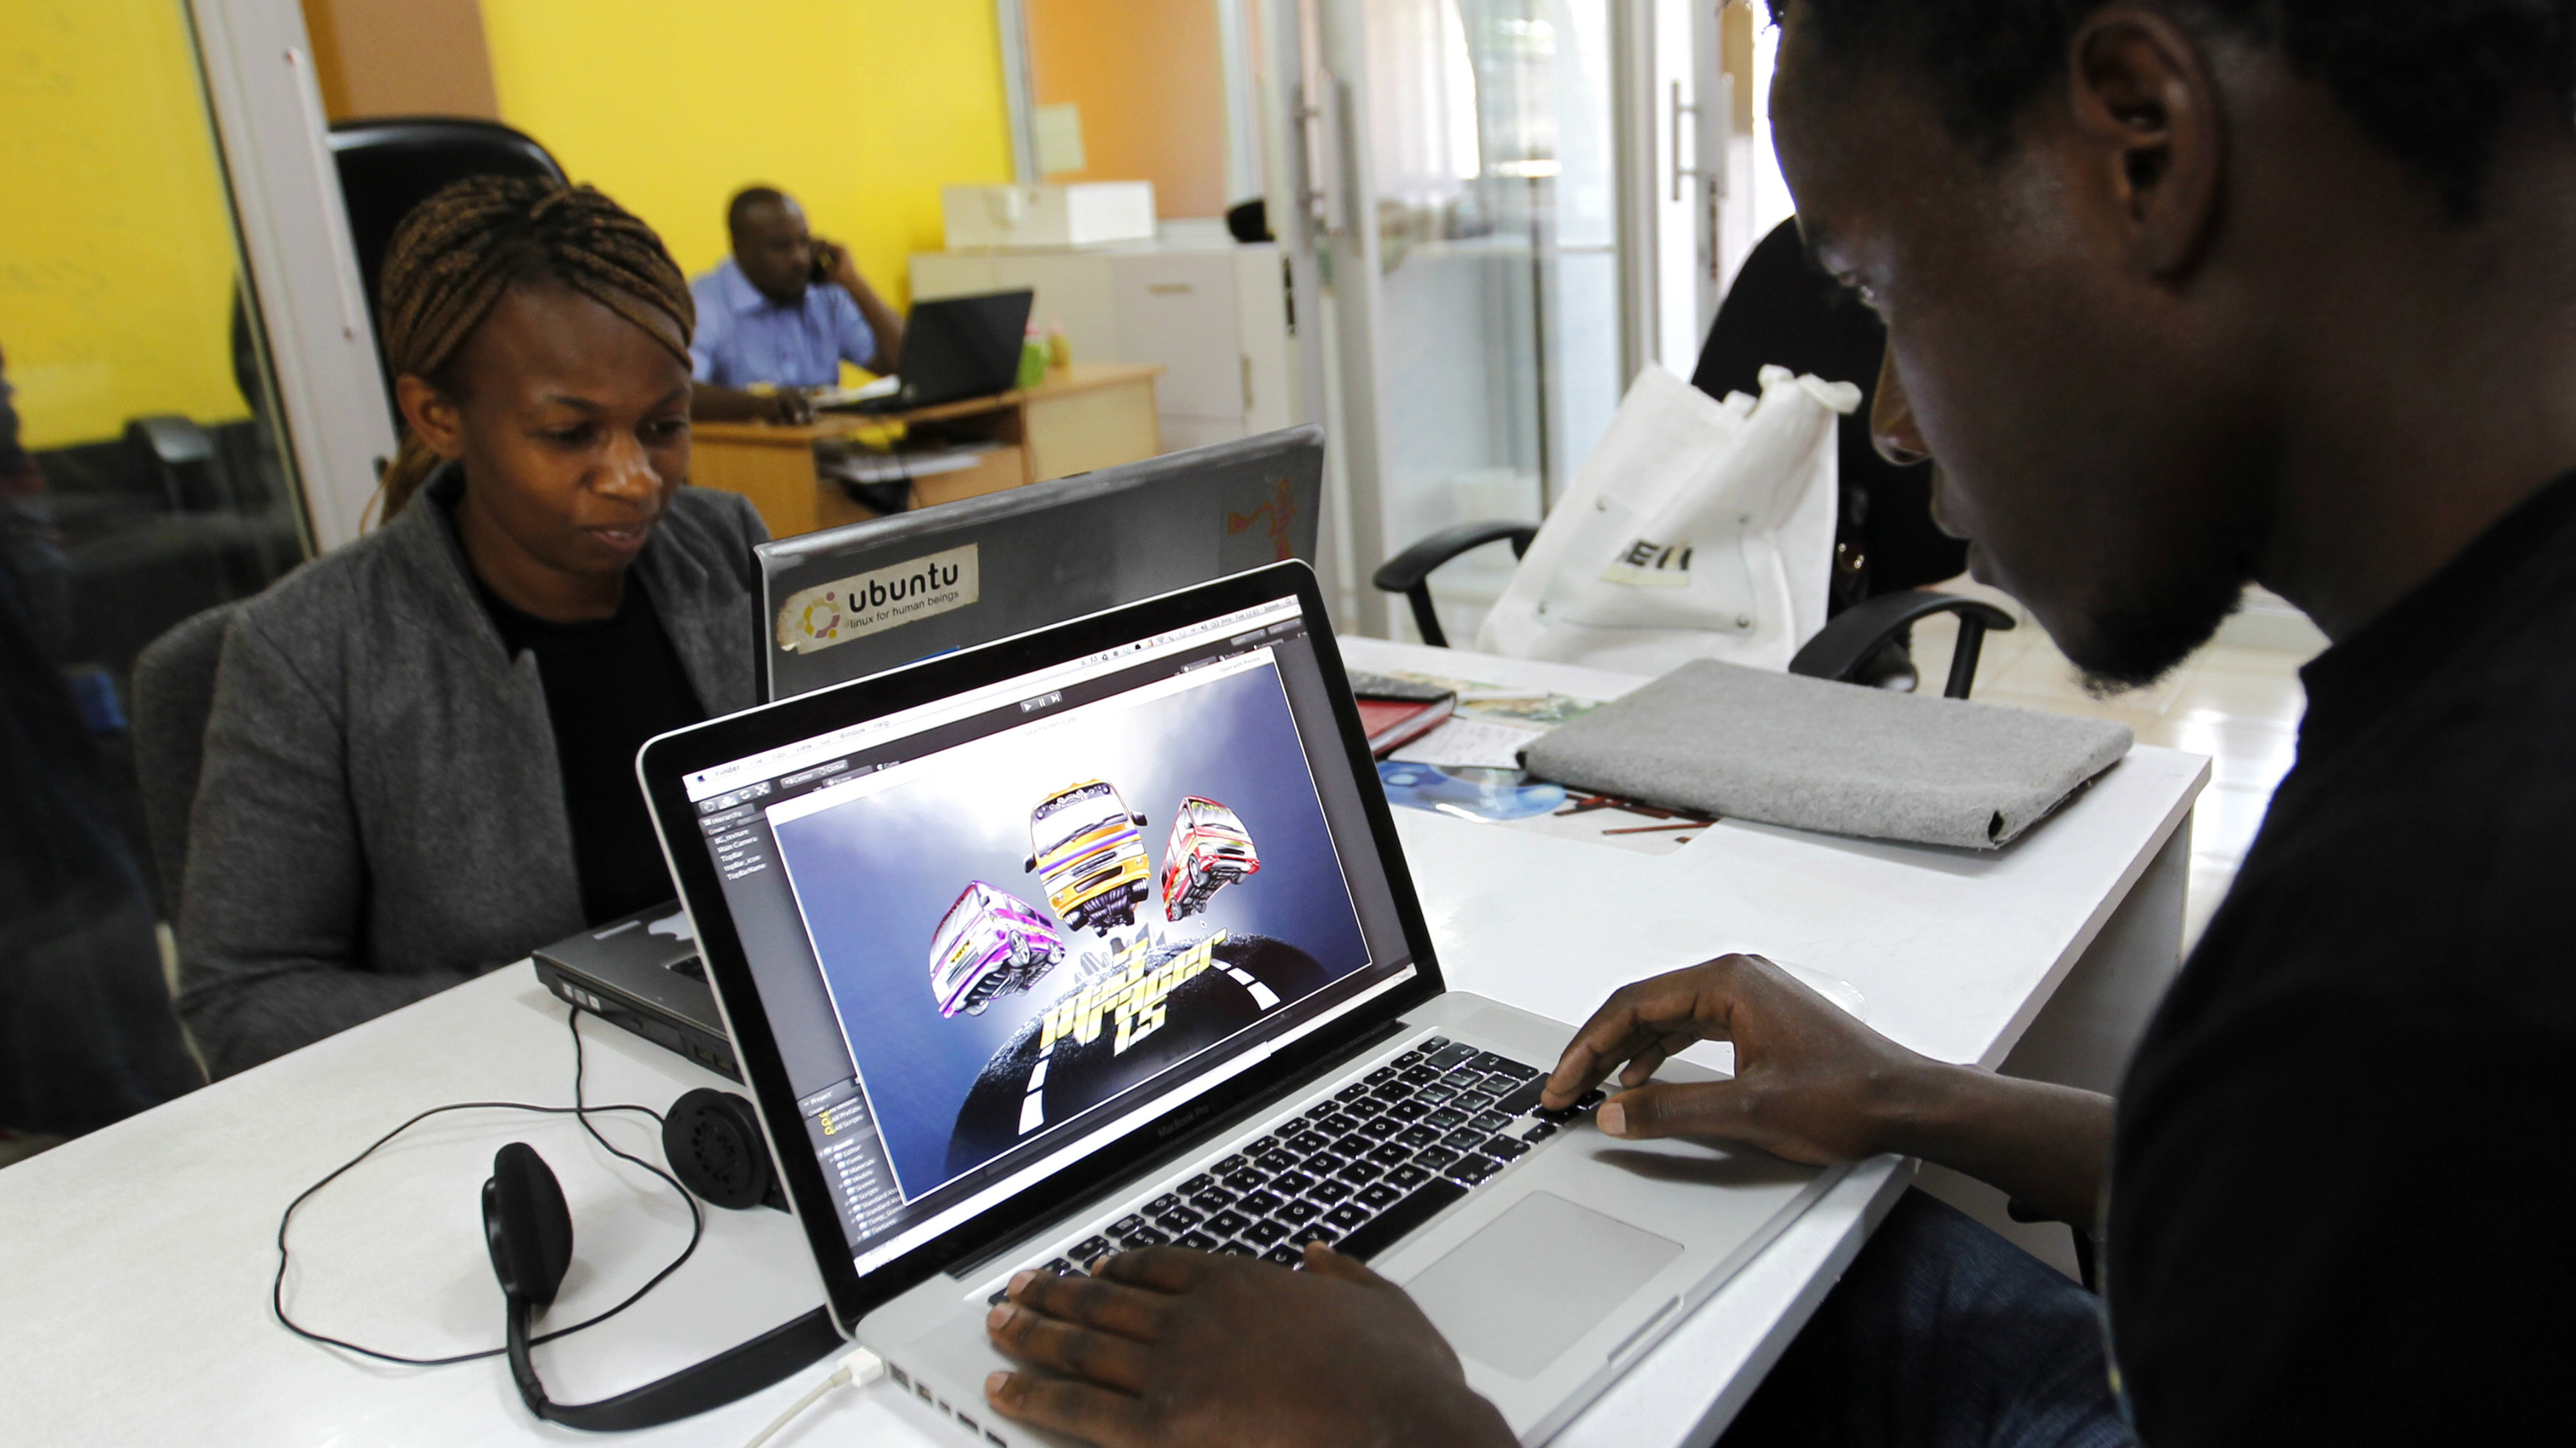 Duncan Onyango, a game design developer at Planet Rackus works on MA3Racer, a 2D mobile game inside his studio in Kenya's capital Nairobi, July 15, 2014.